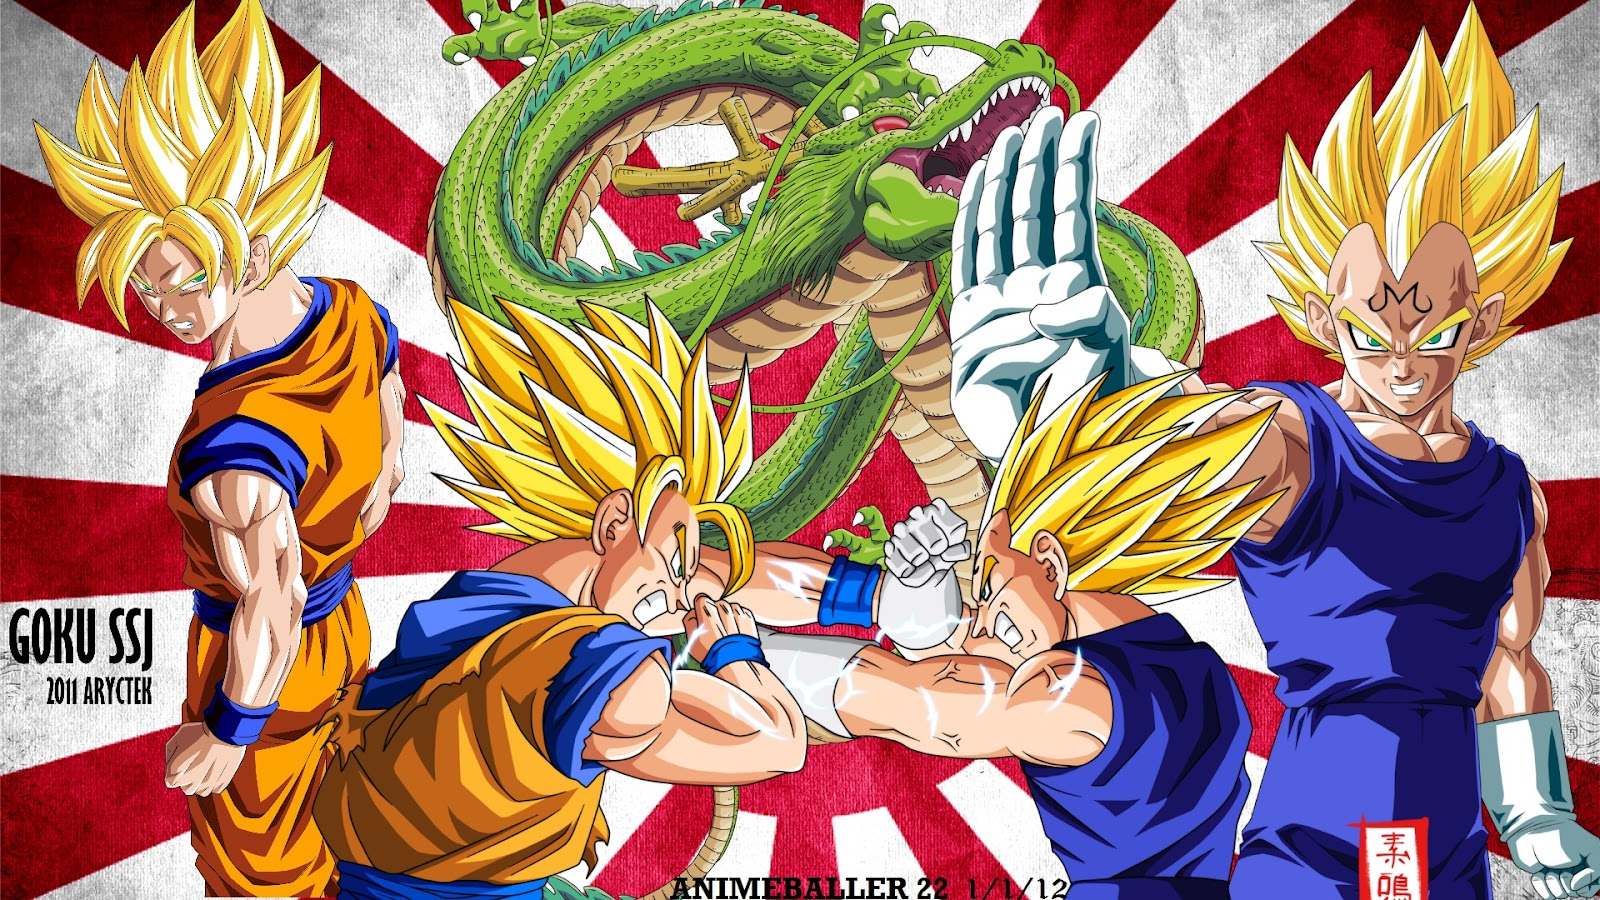 Majin Vegeta Vs Goku Wallpaper